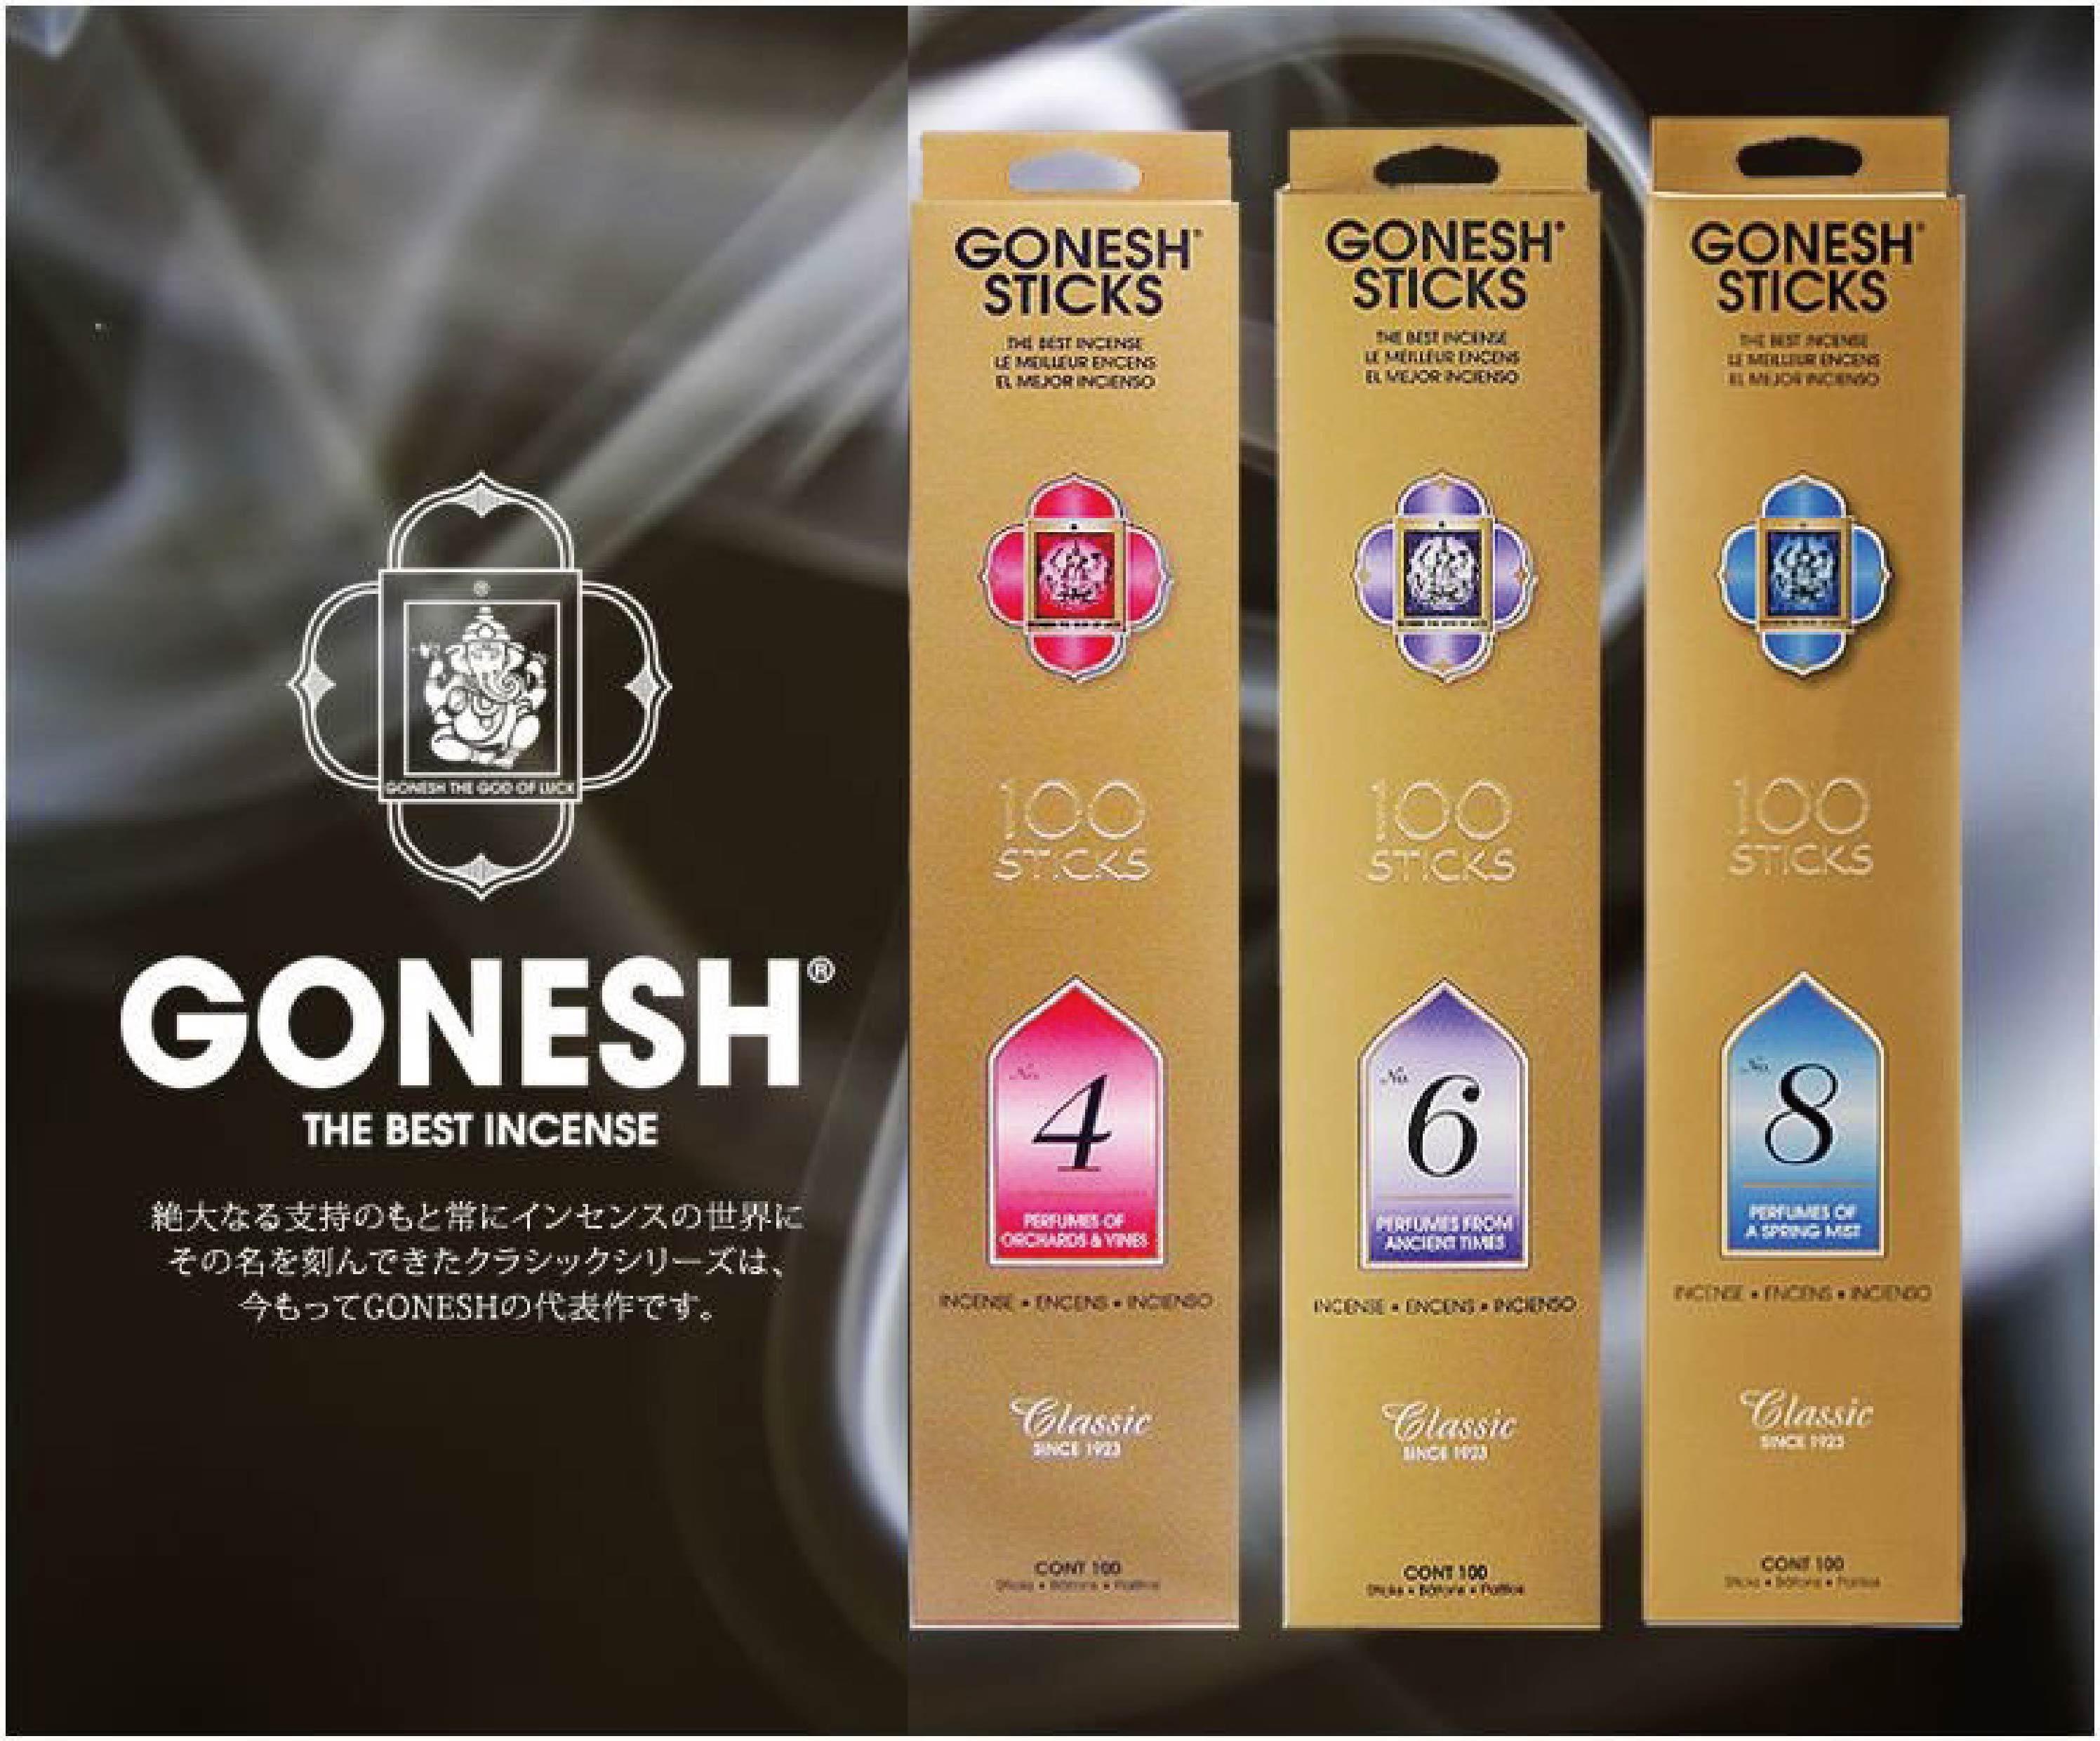 【 GONESH精油線香 - (100支入) / 另可加購線香盤 】